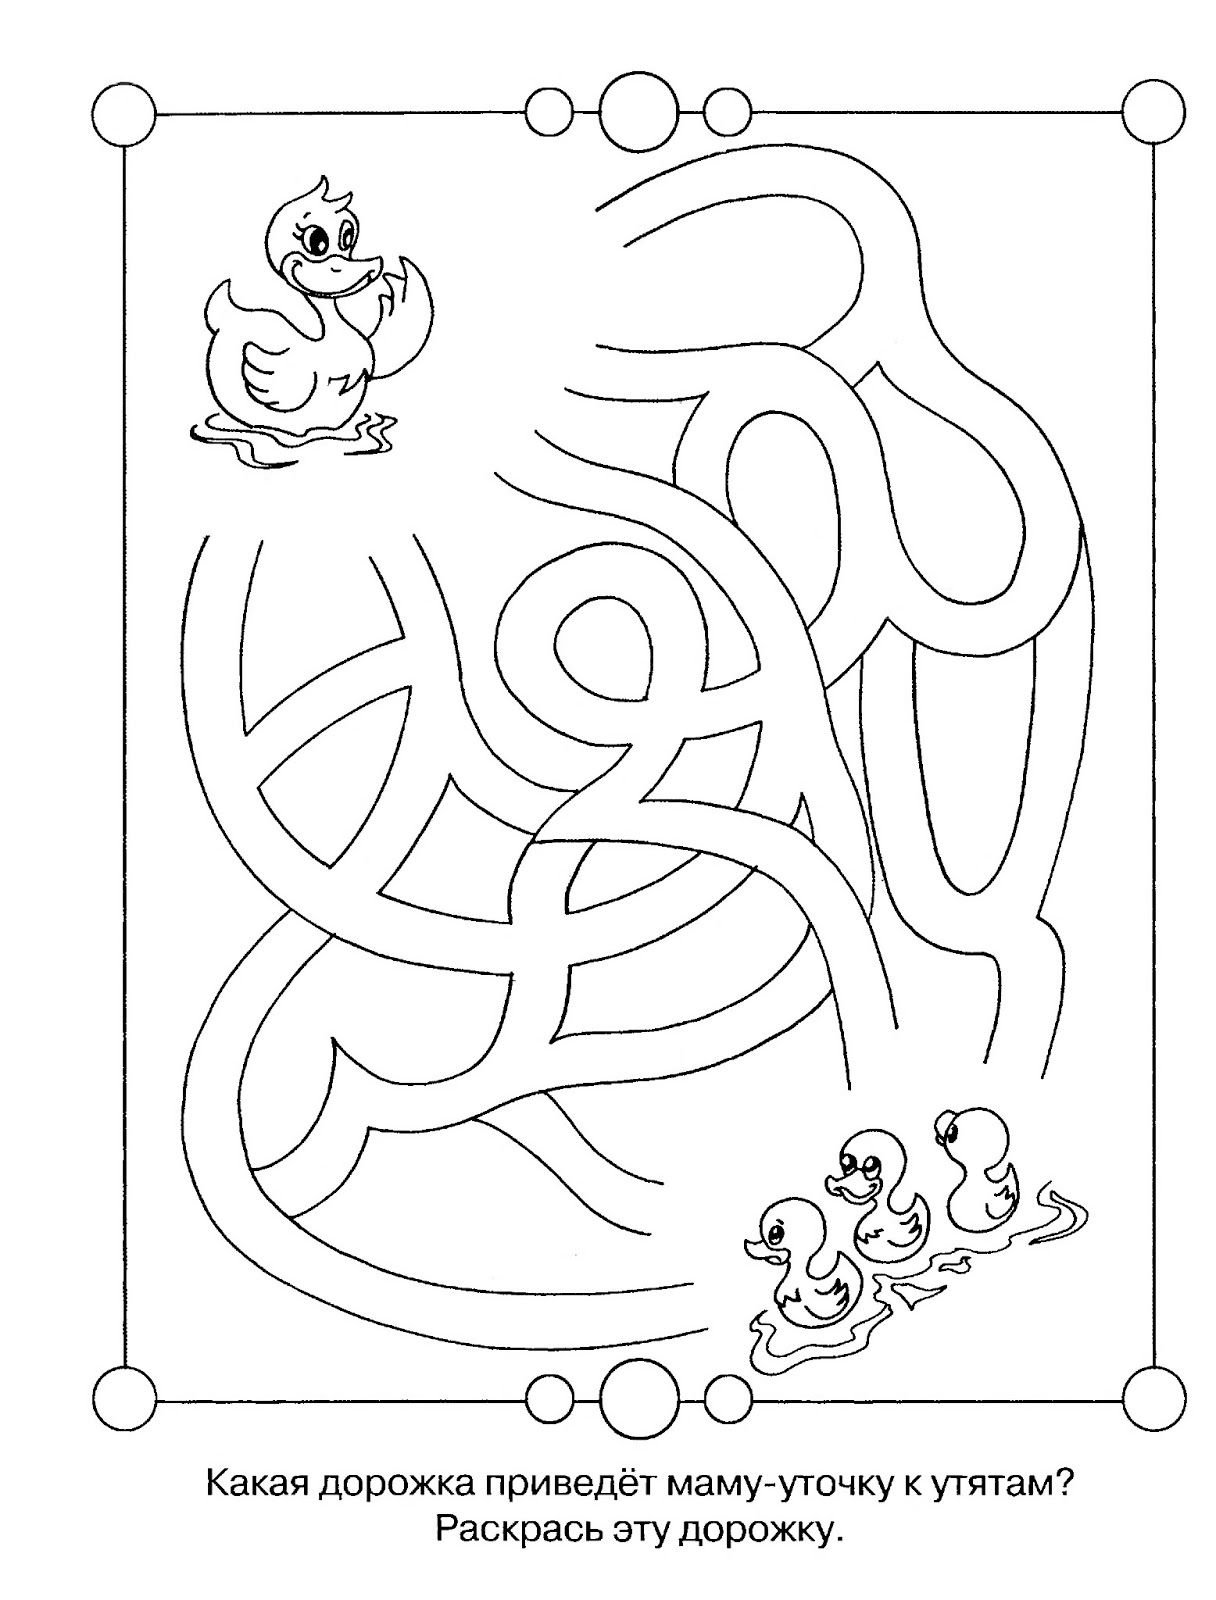 Child Development Rebus Puzzle Gyerekeknek Allatok